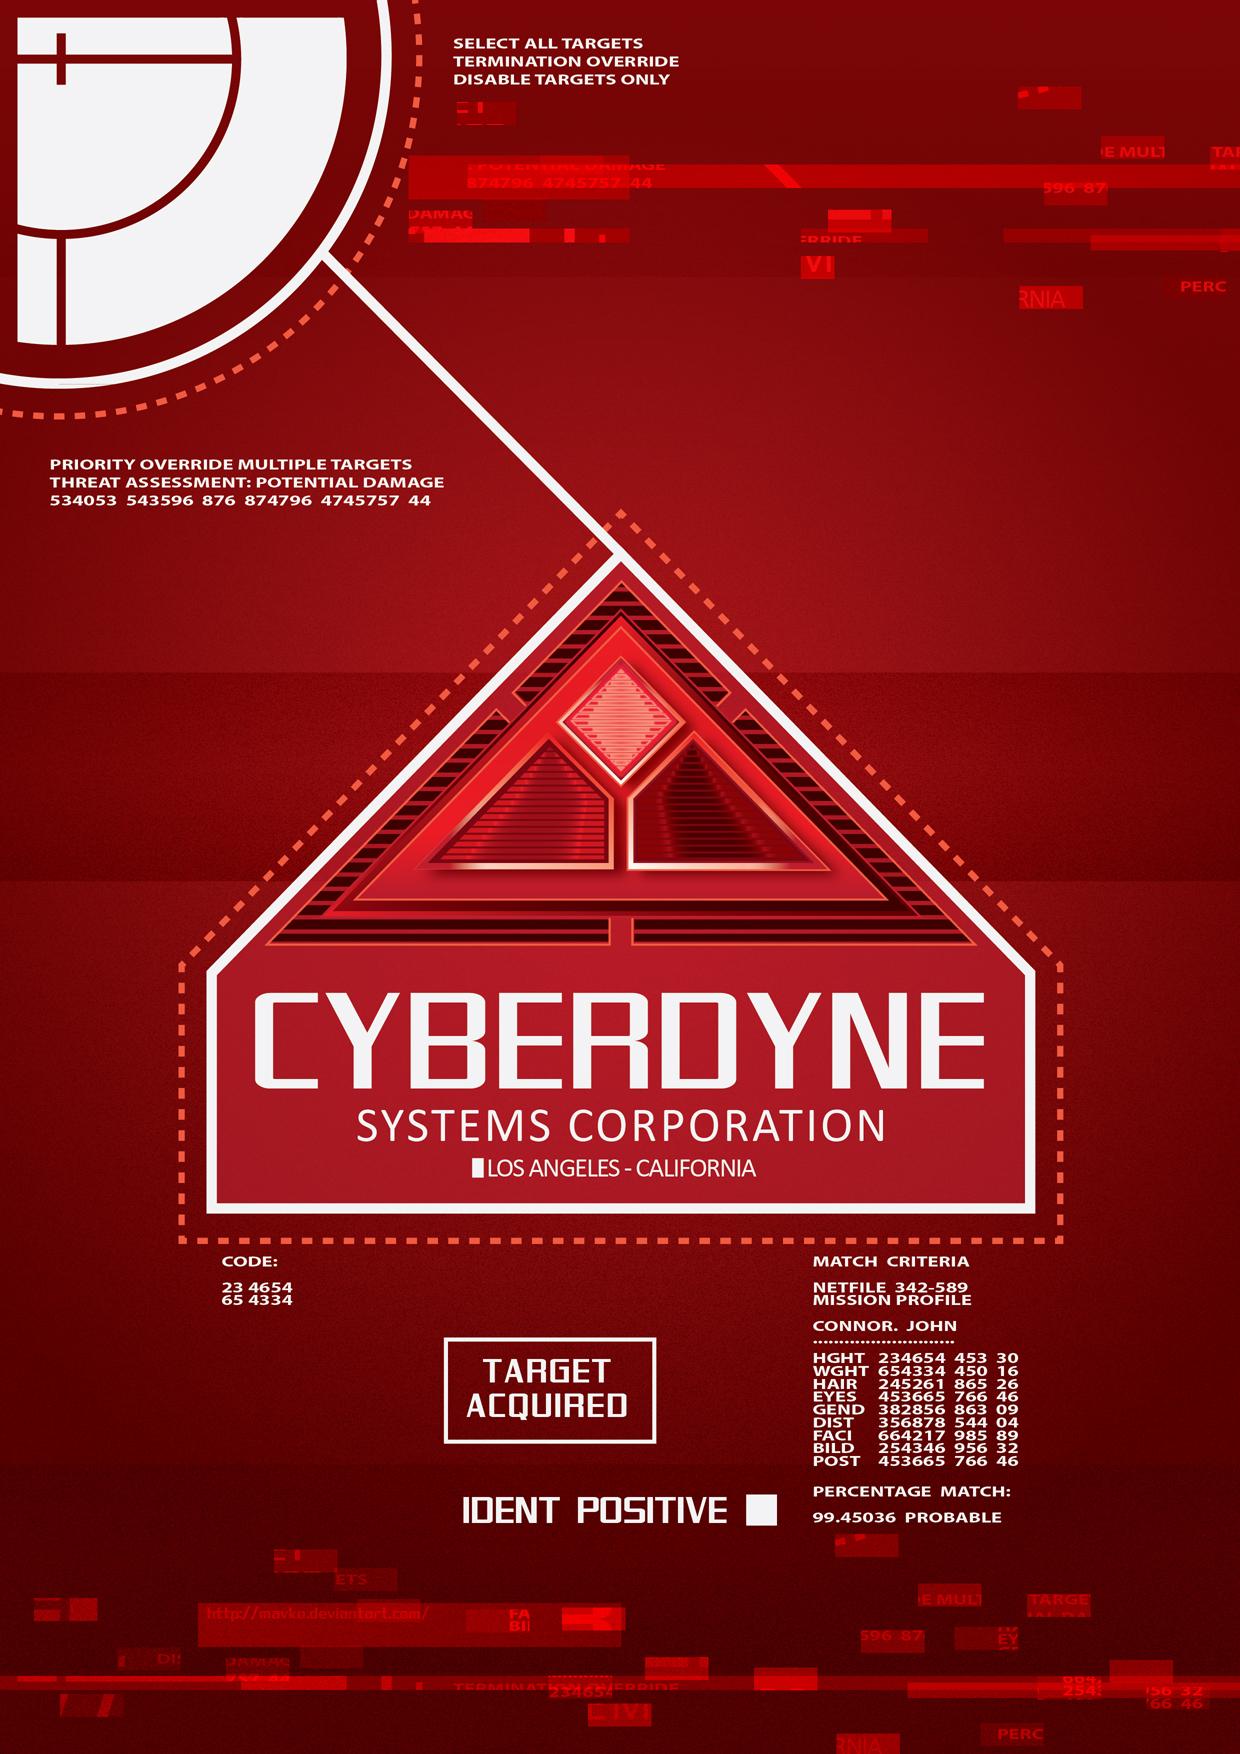 cyberdyne systems wallpaper